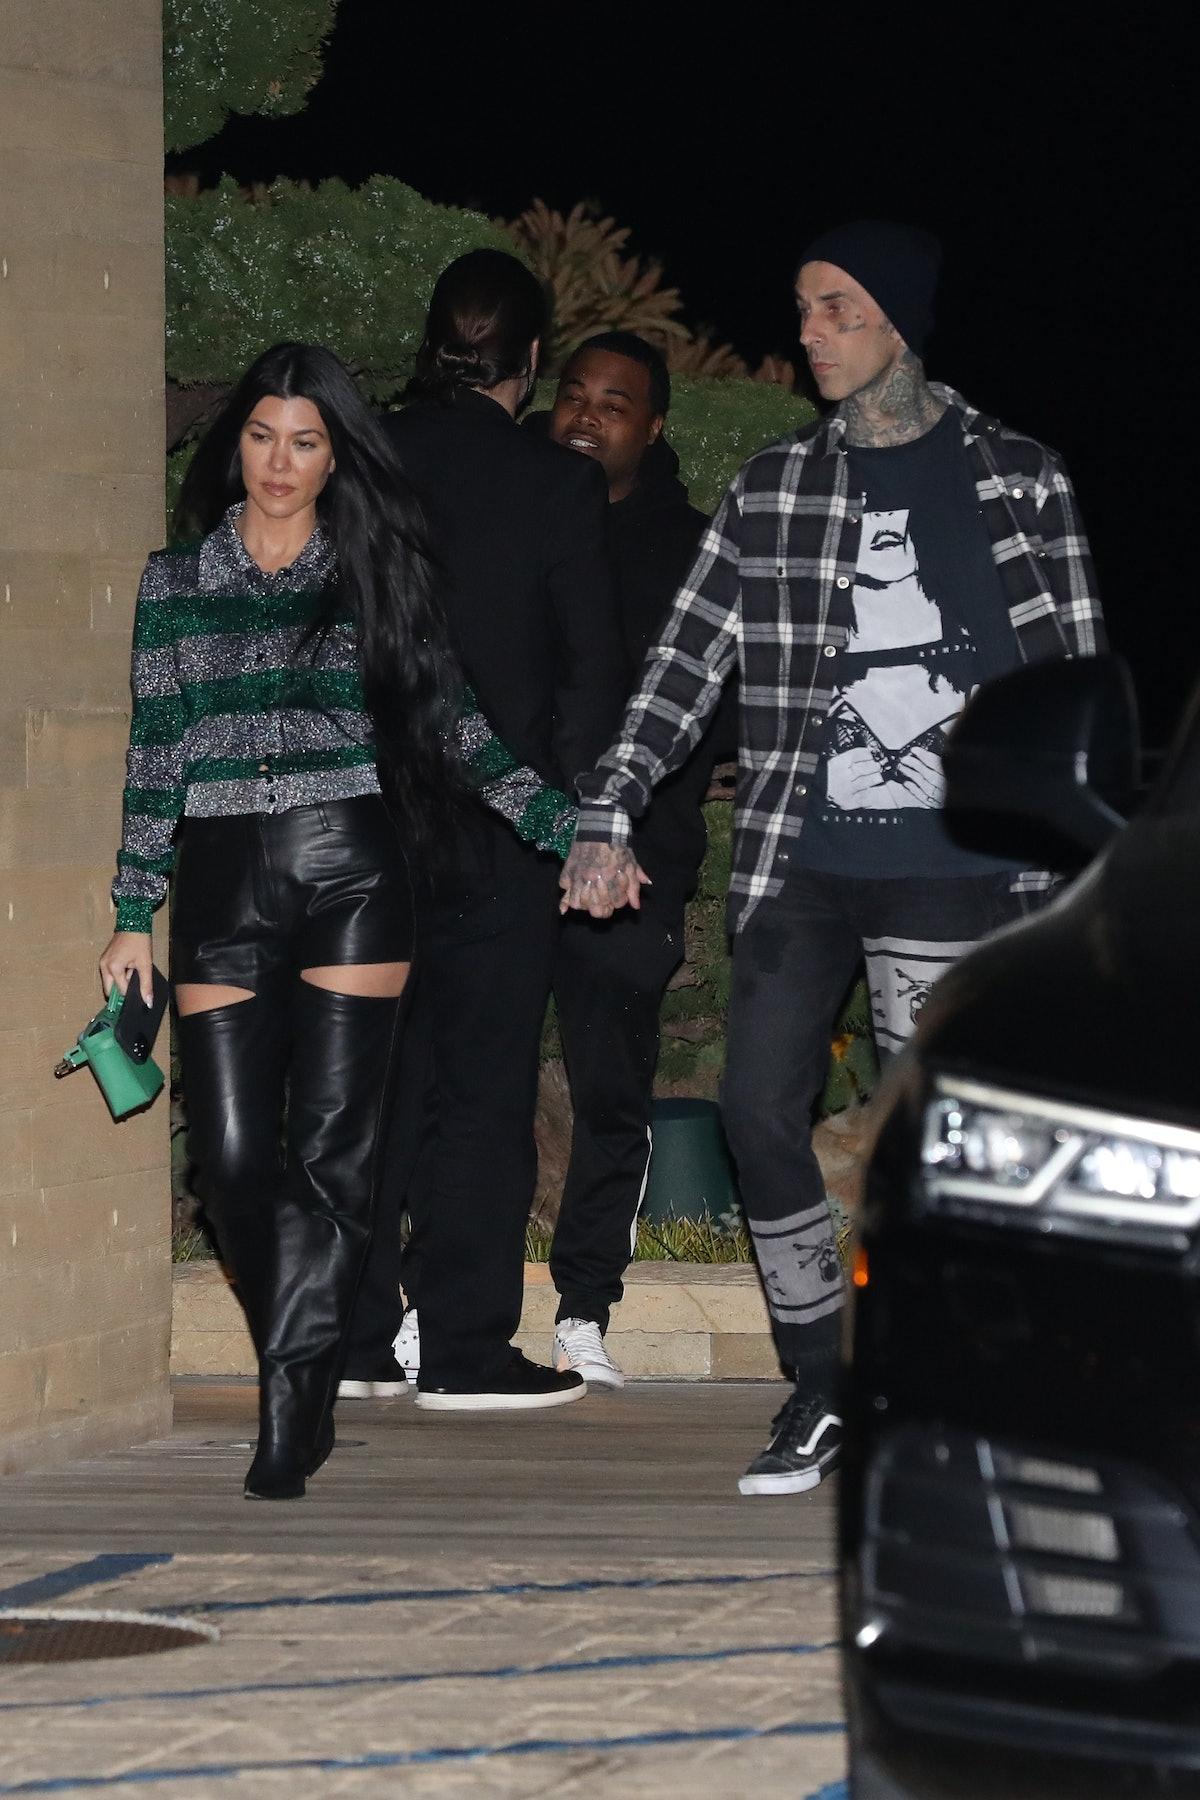 Kourtney Kardashian and Travis Barker's photo at Machine Gun Kelly's birthday is another sweet double date.